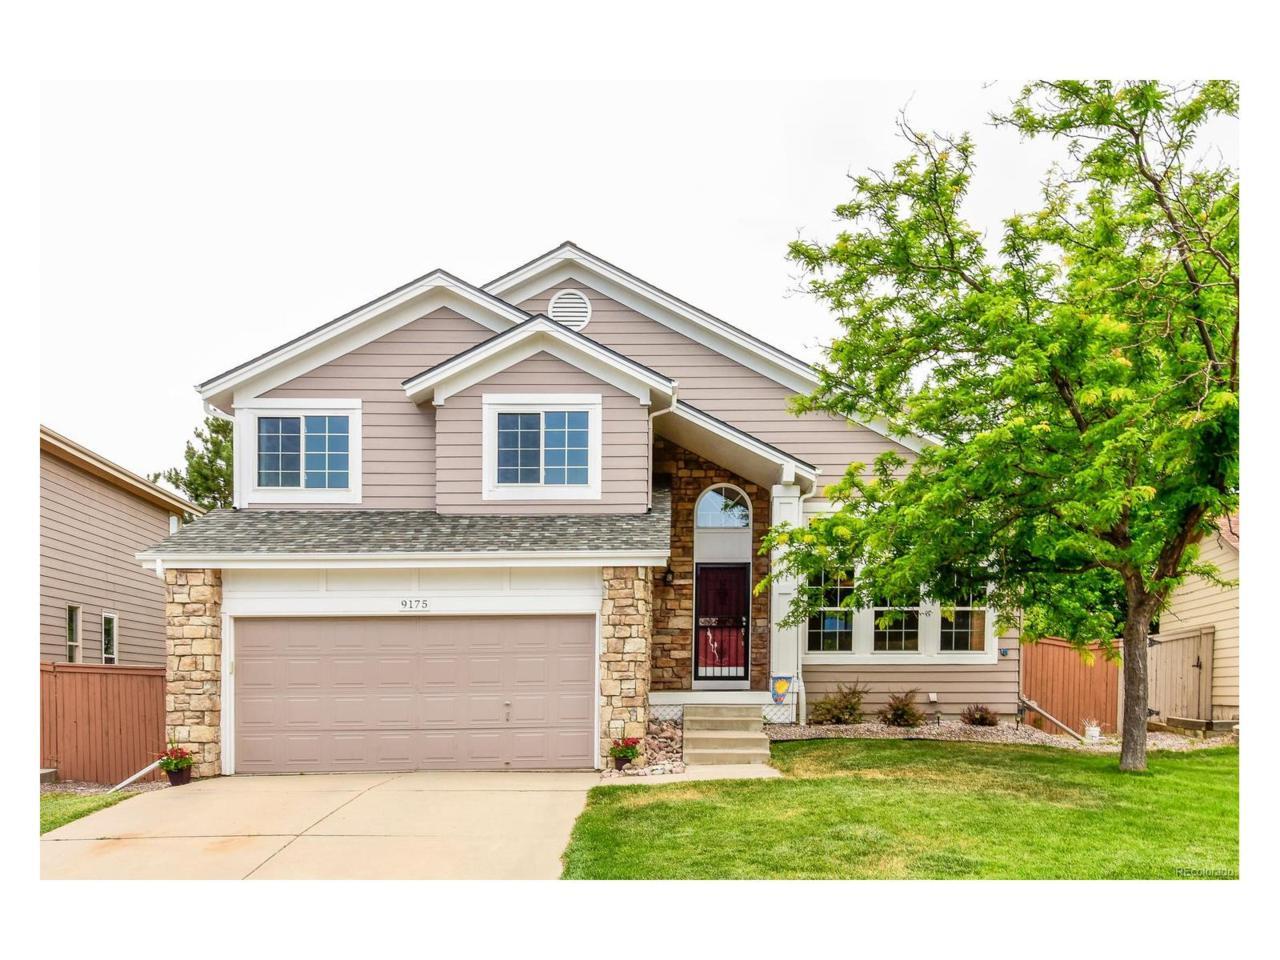 9175 Sugarstone Circle, Highlands Ranch, CO 80130 (MLS #4963839) :: 8z Real Estate